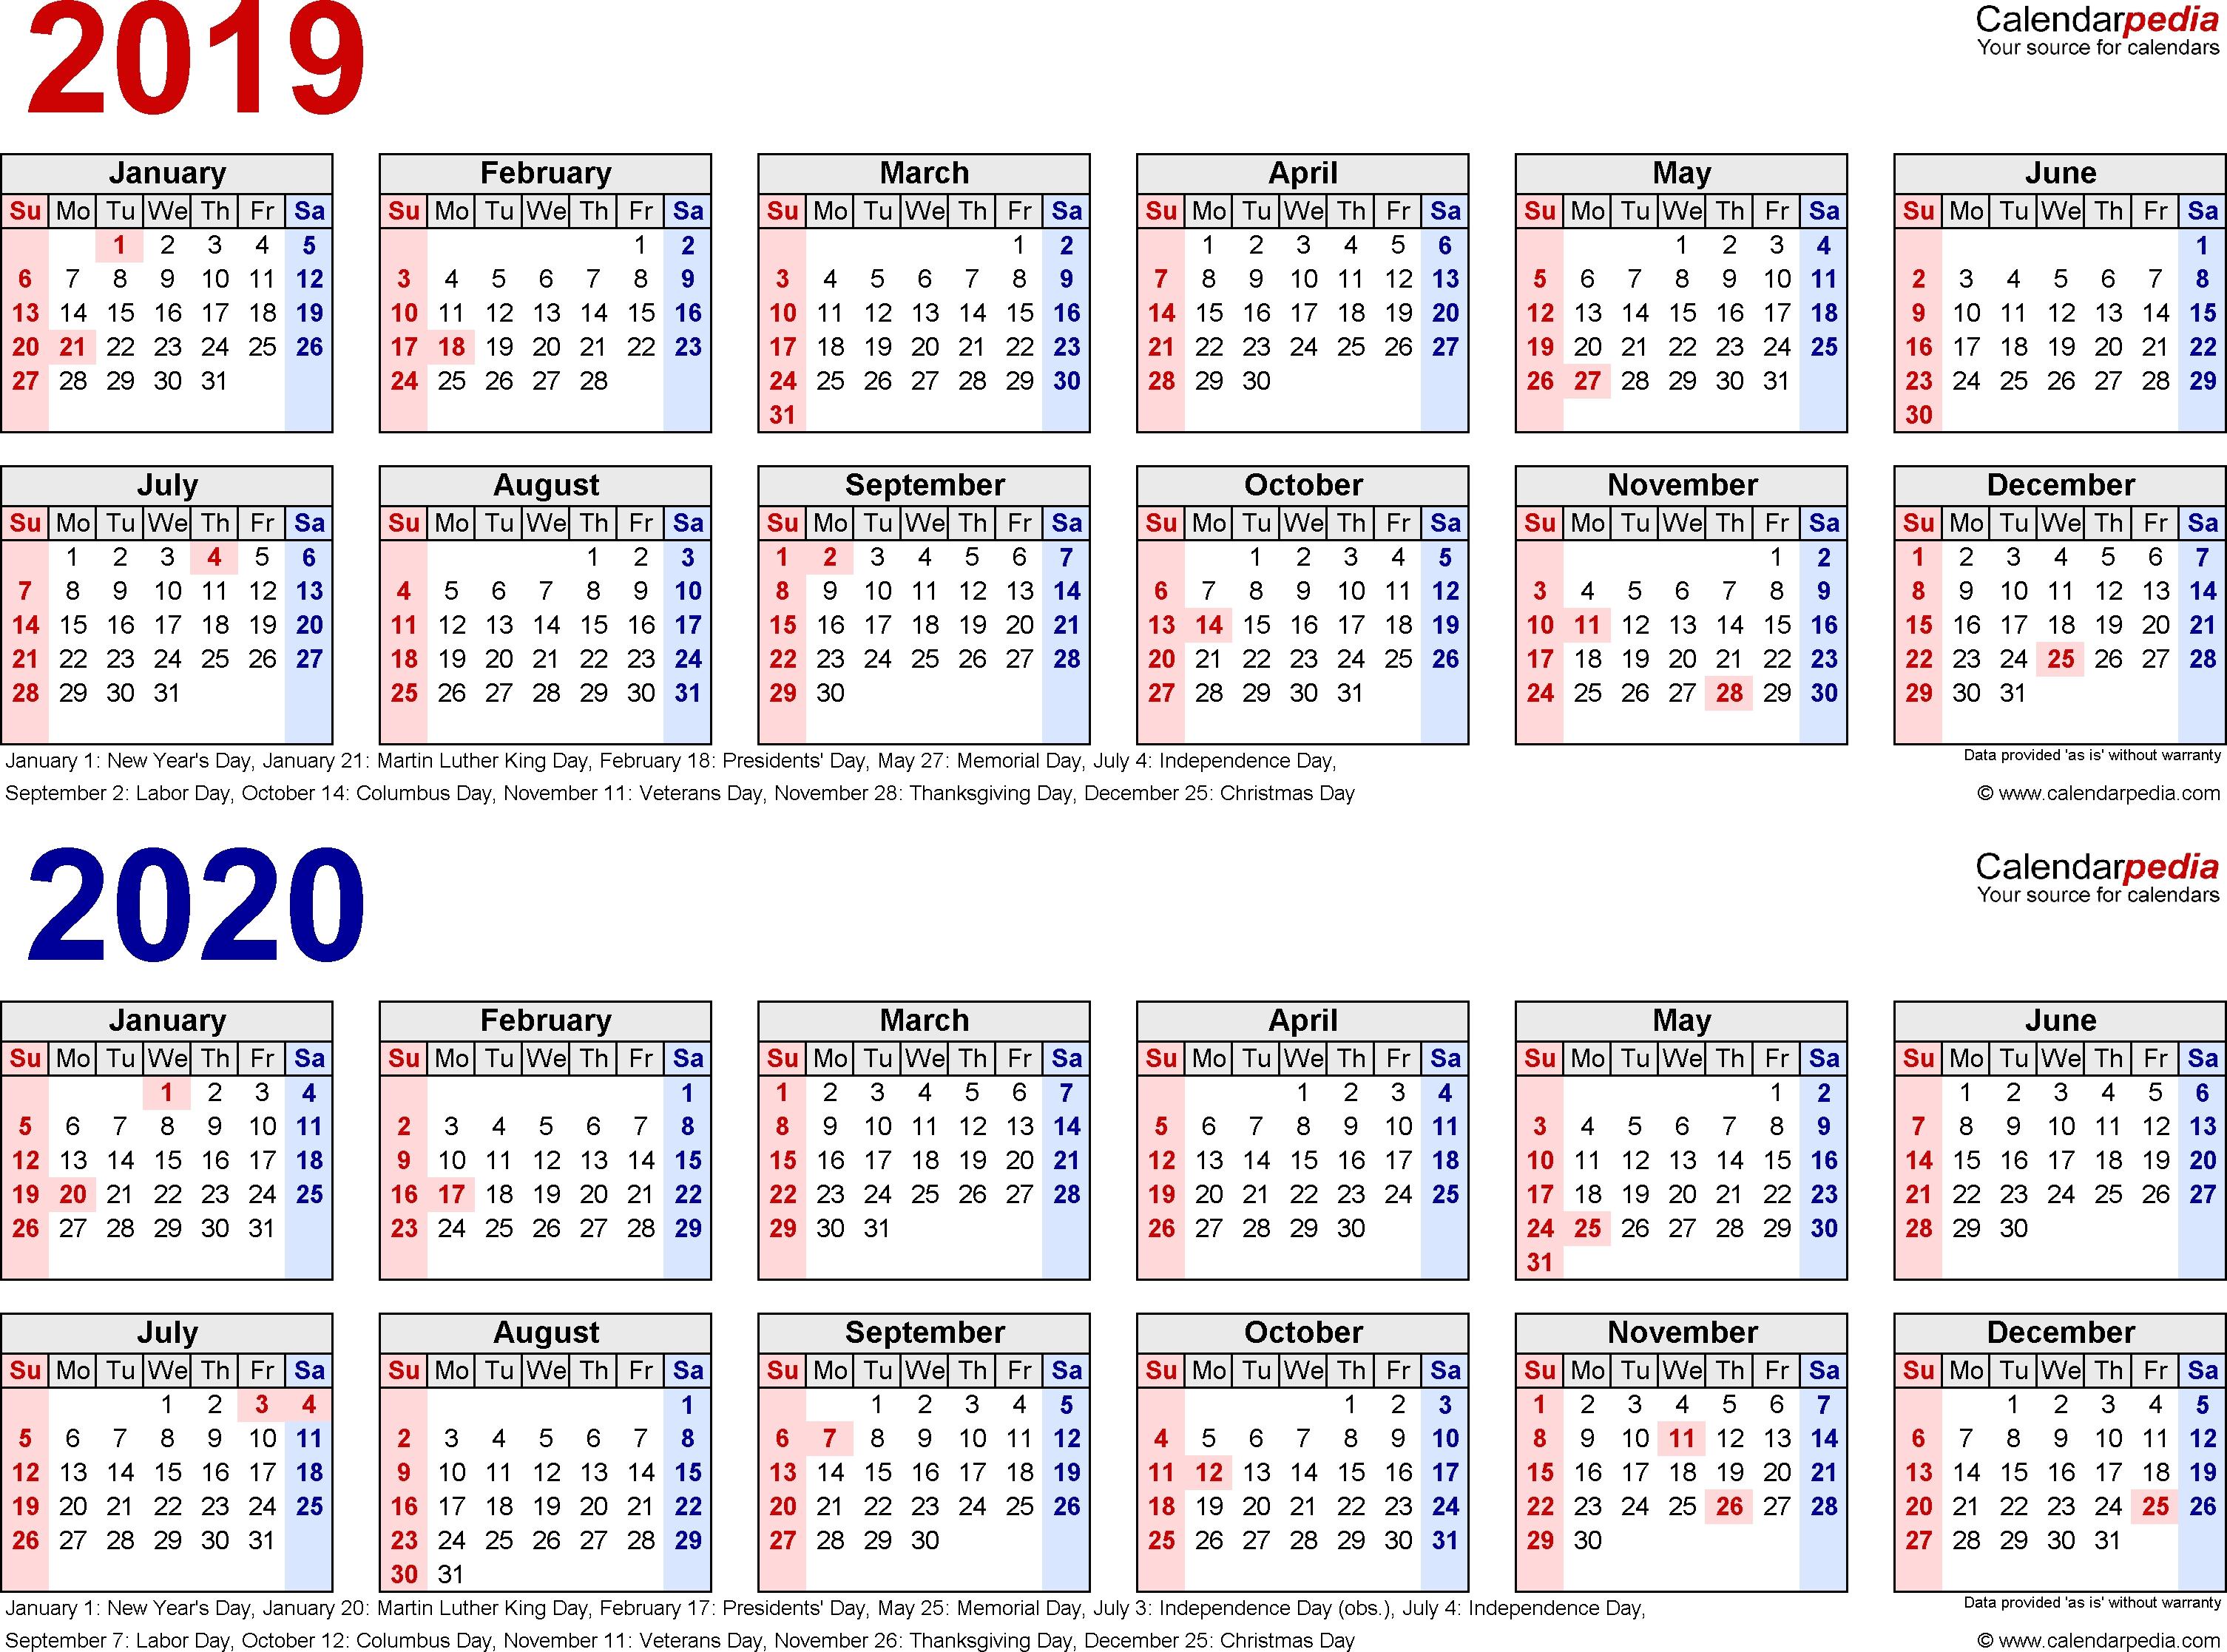 2019-2020 Calendar - Free Printable Two-Year Word Calendars with regard to U Of C Calendar 2019/2020